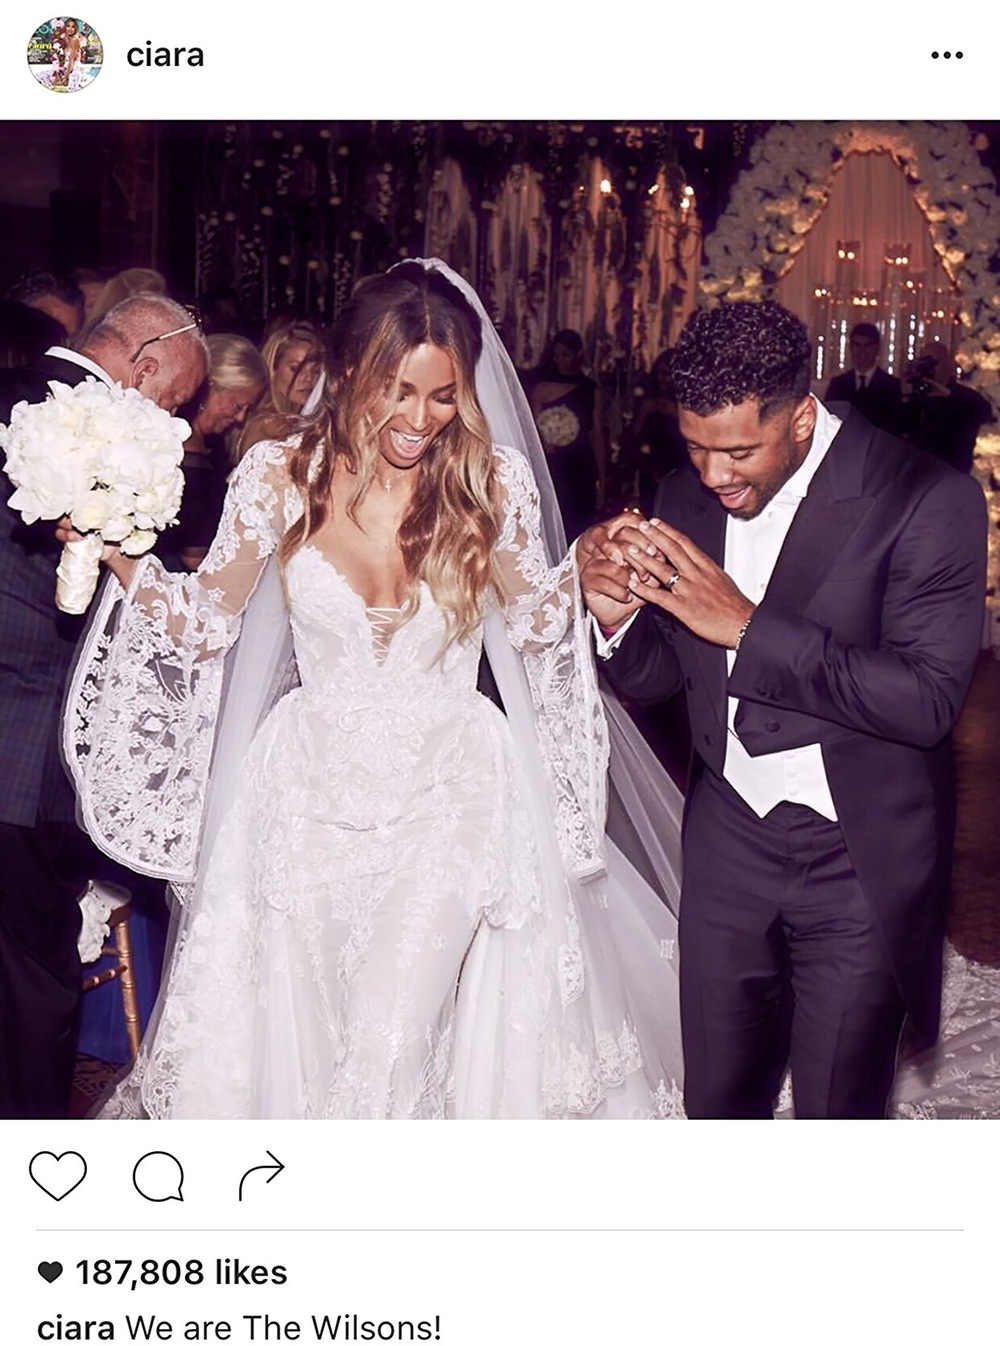 Image courtesy of Ciara's Instagram